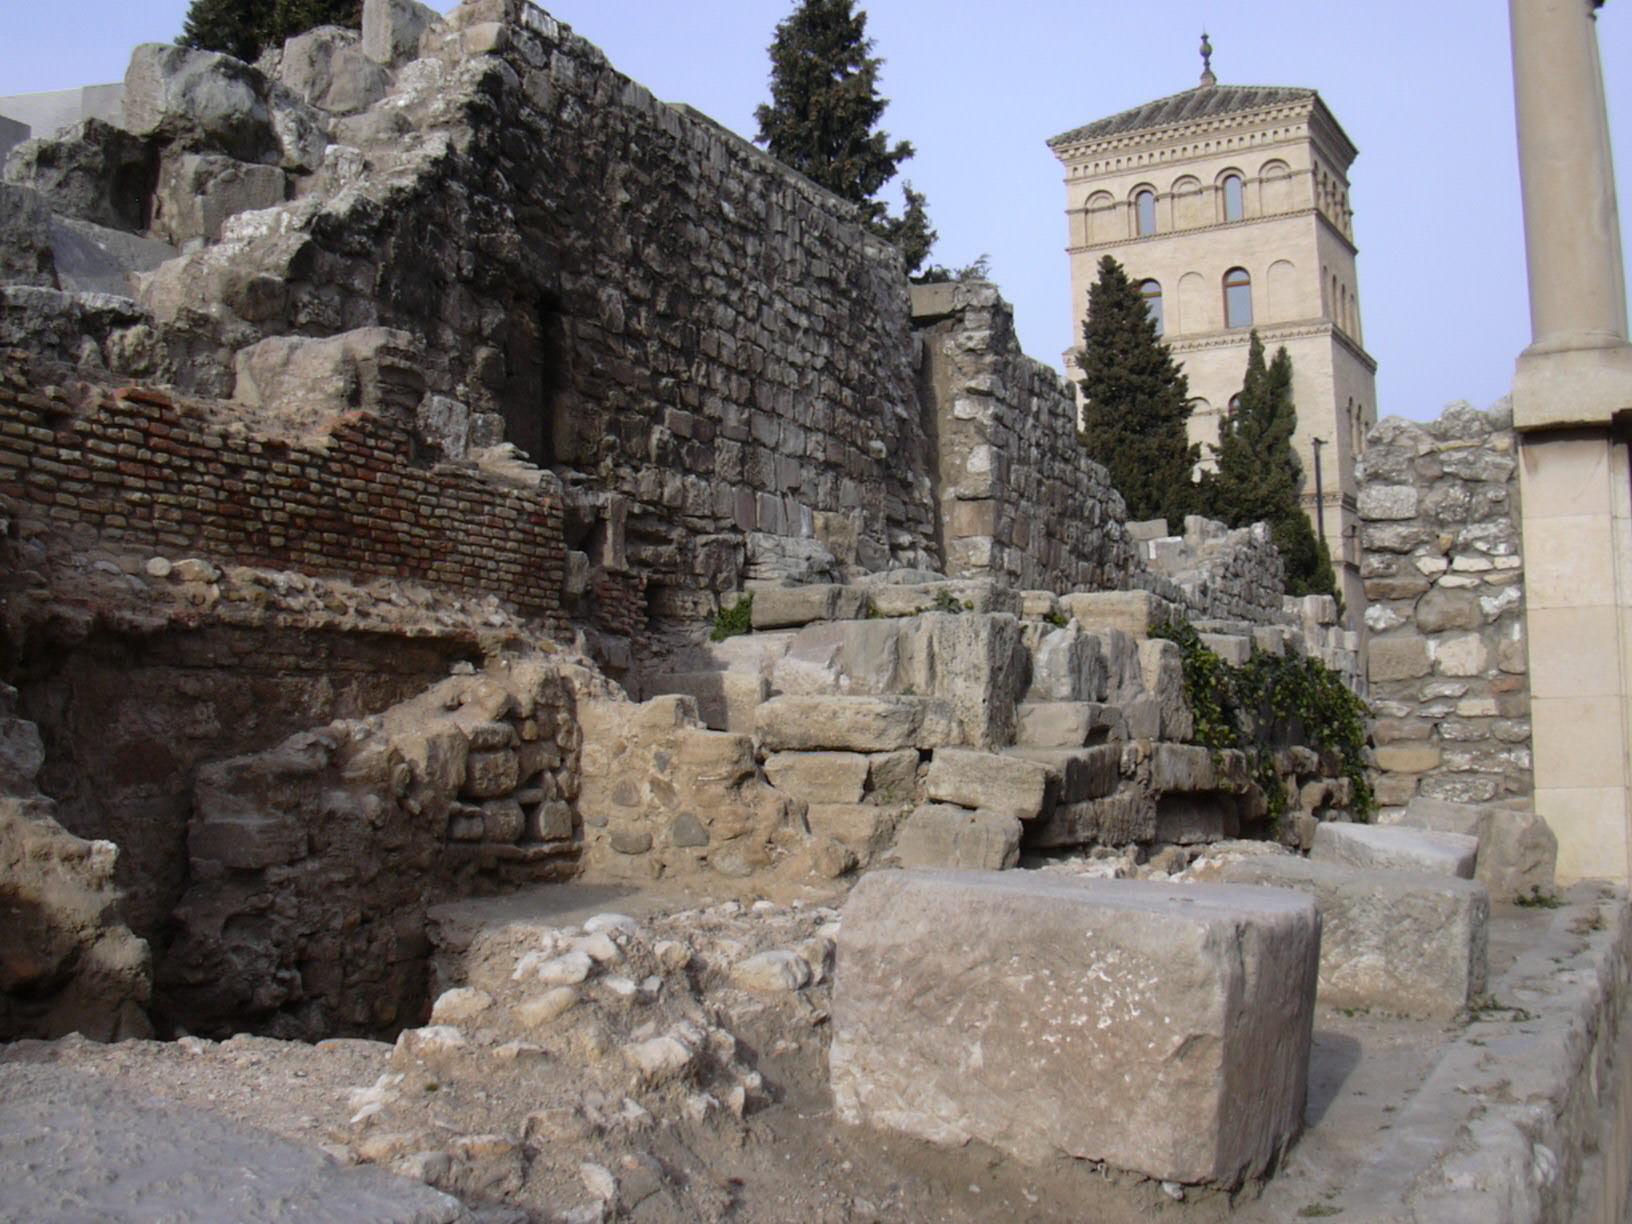 Ruins of Zaragoza